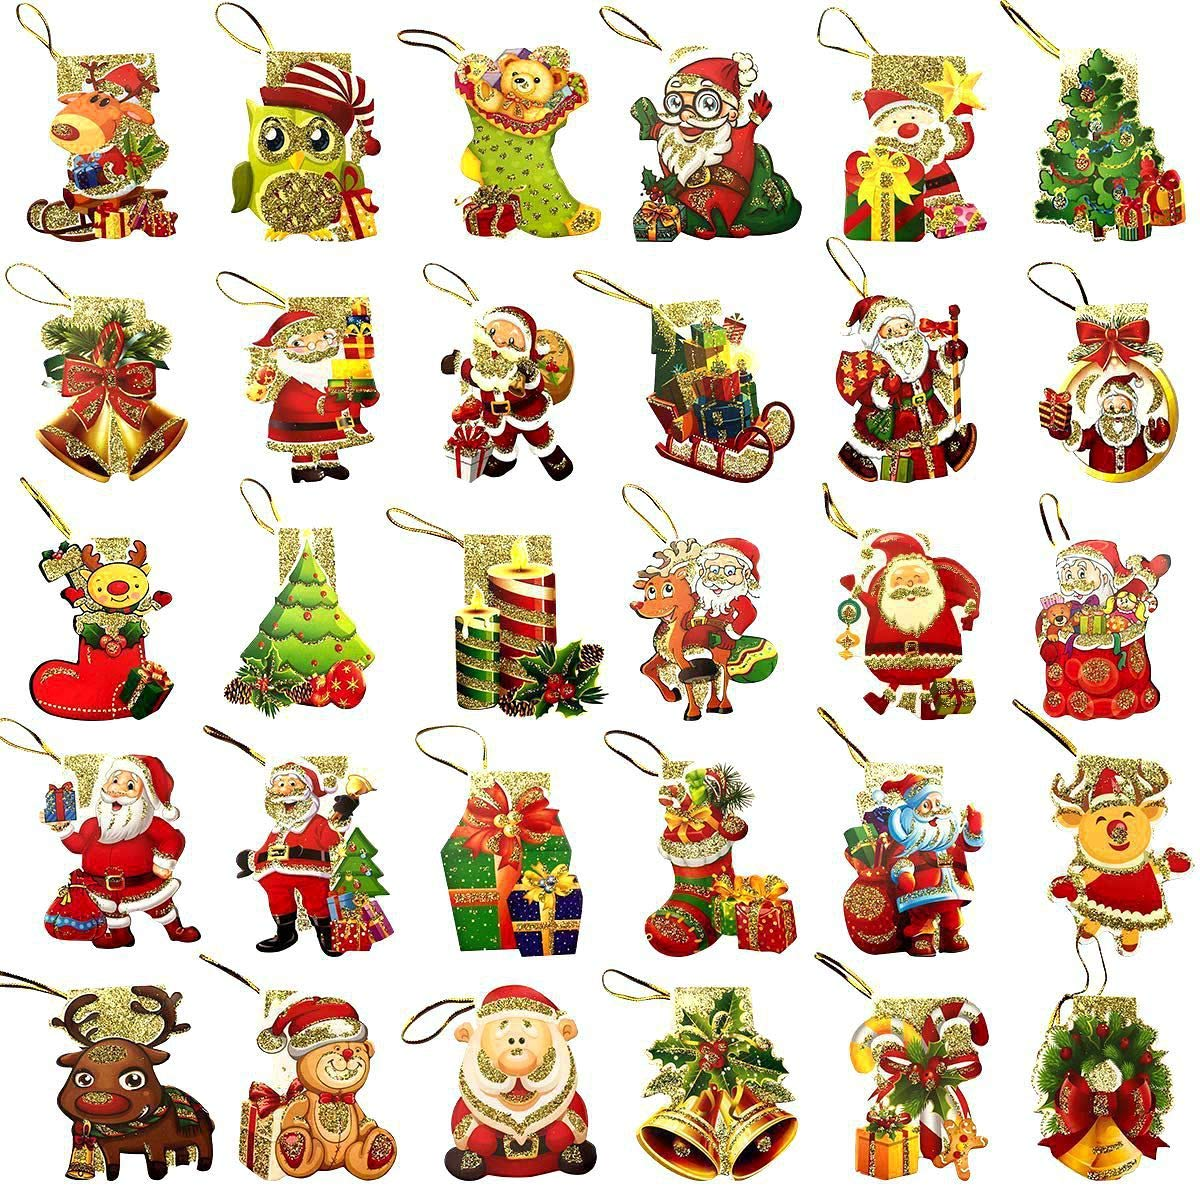 CODOHI Weihnachts-Geschenkanhä nger zum Anbinden mit Kordel, 240 Stü ck Christmas Cards Diamond Painting Kit 8 PCS